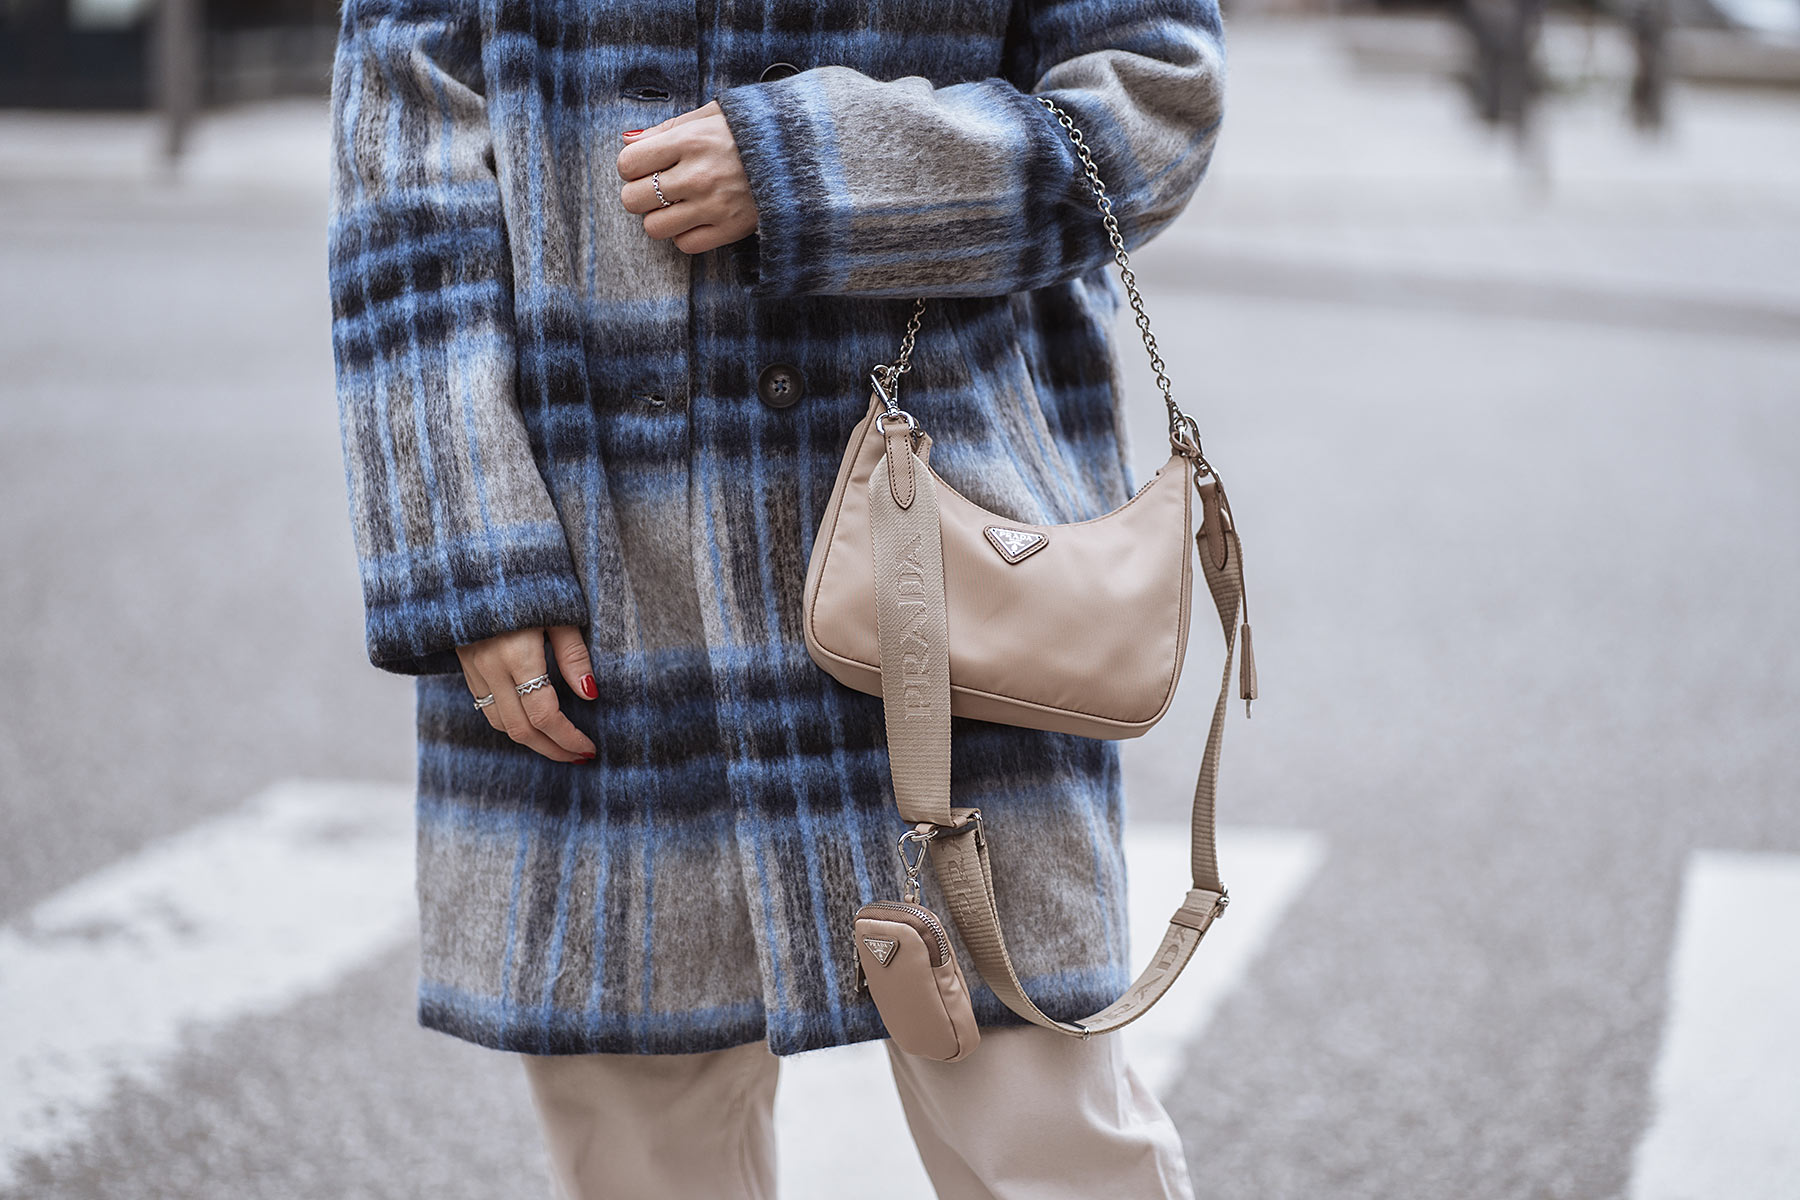 prada multi-pochette bag nylon re-edition 2005 beige fashion blogger inga brauer sunnyinga